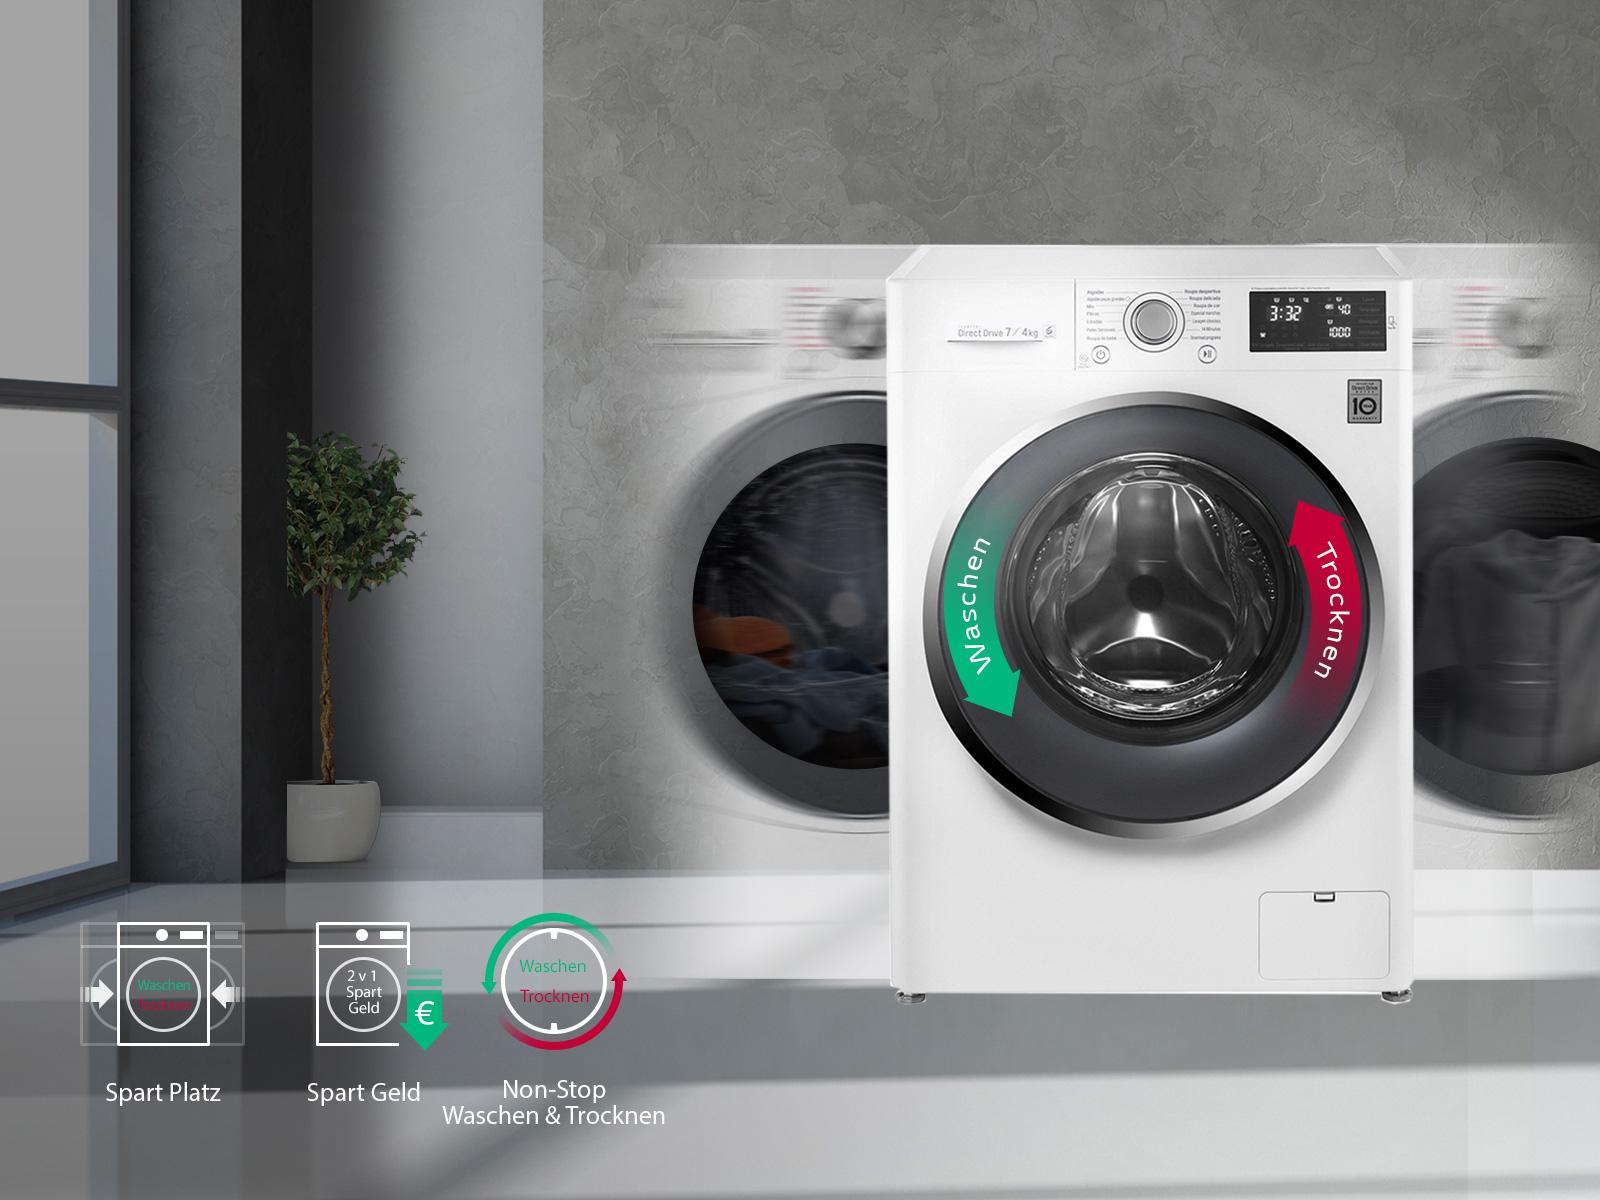 lg waschtrockner mit 6 motion direct drive technologie 7 kg waschen 4 kg trocknen bei nur 45. Black Bedroom Furniture Sets. Home Design Ideas